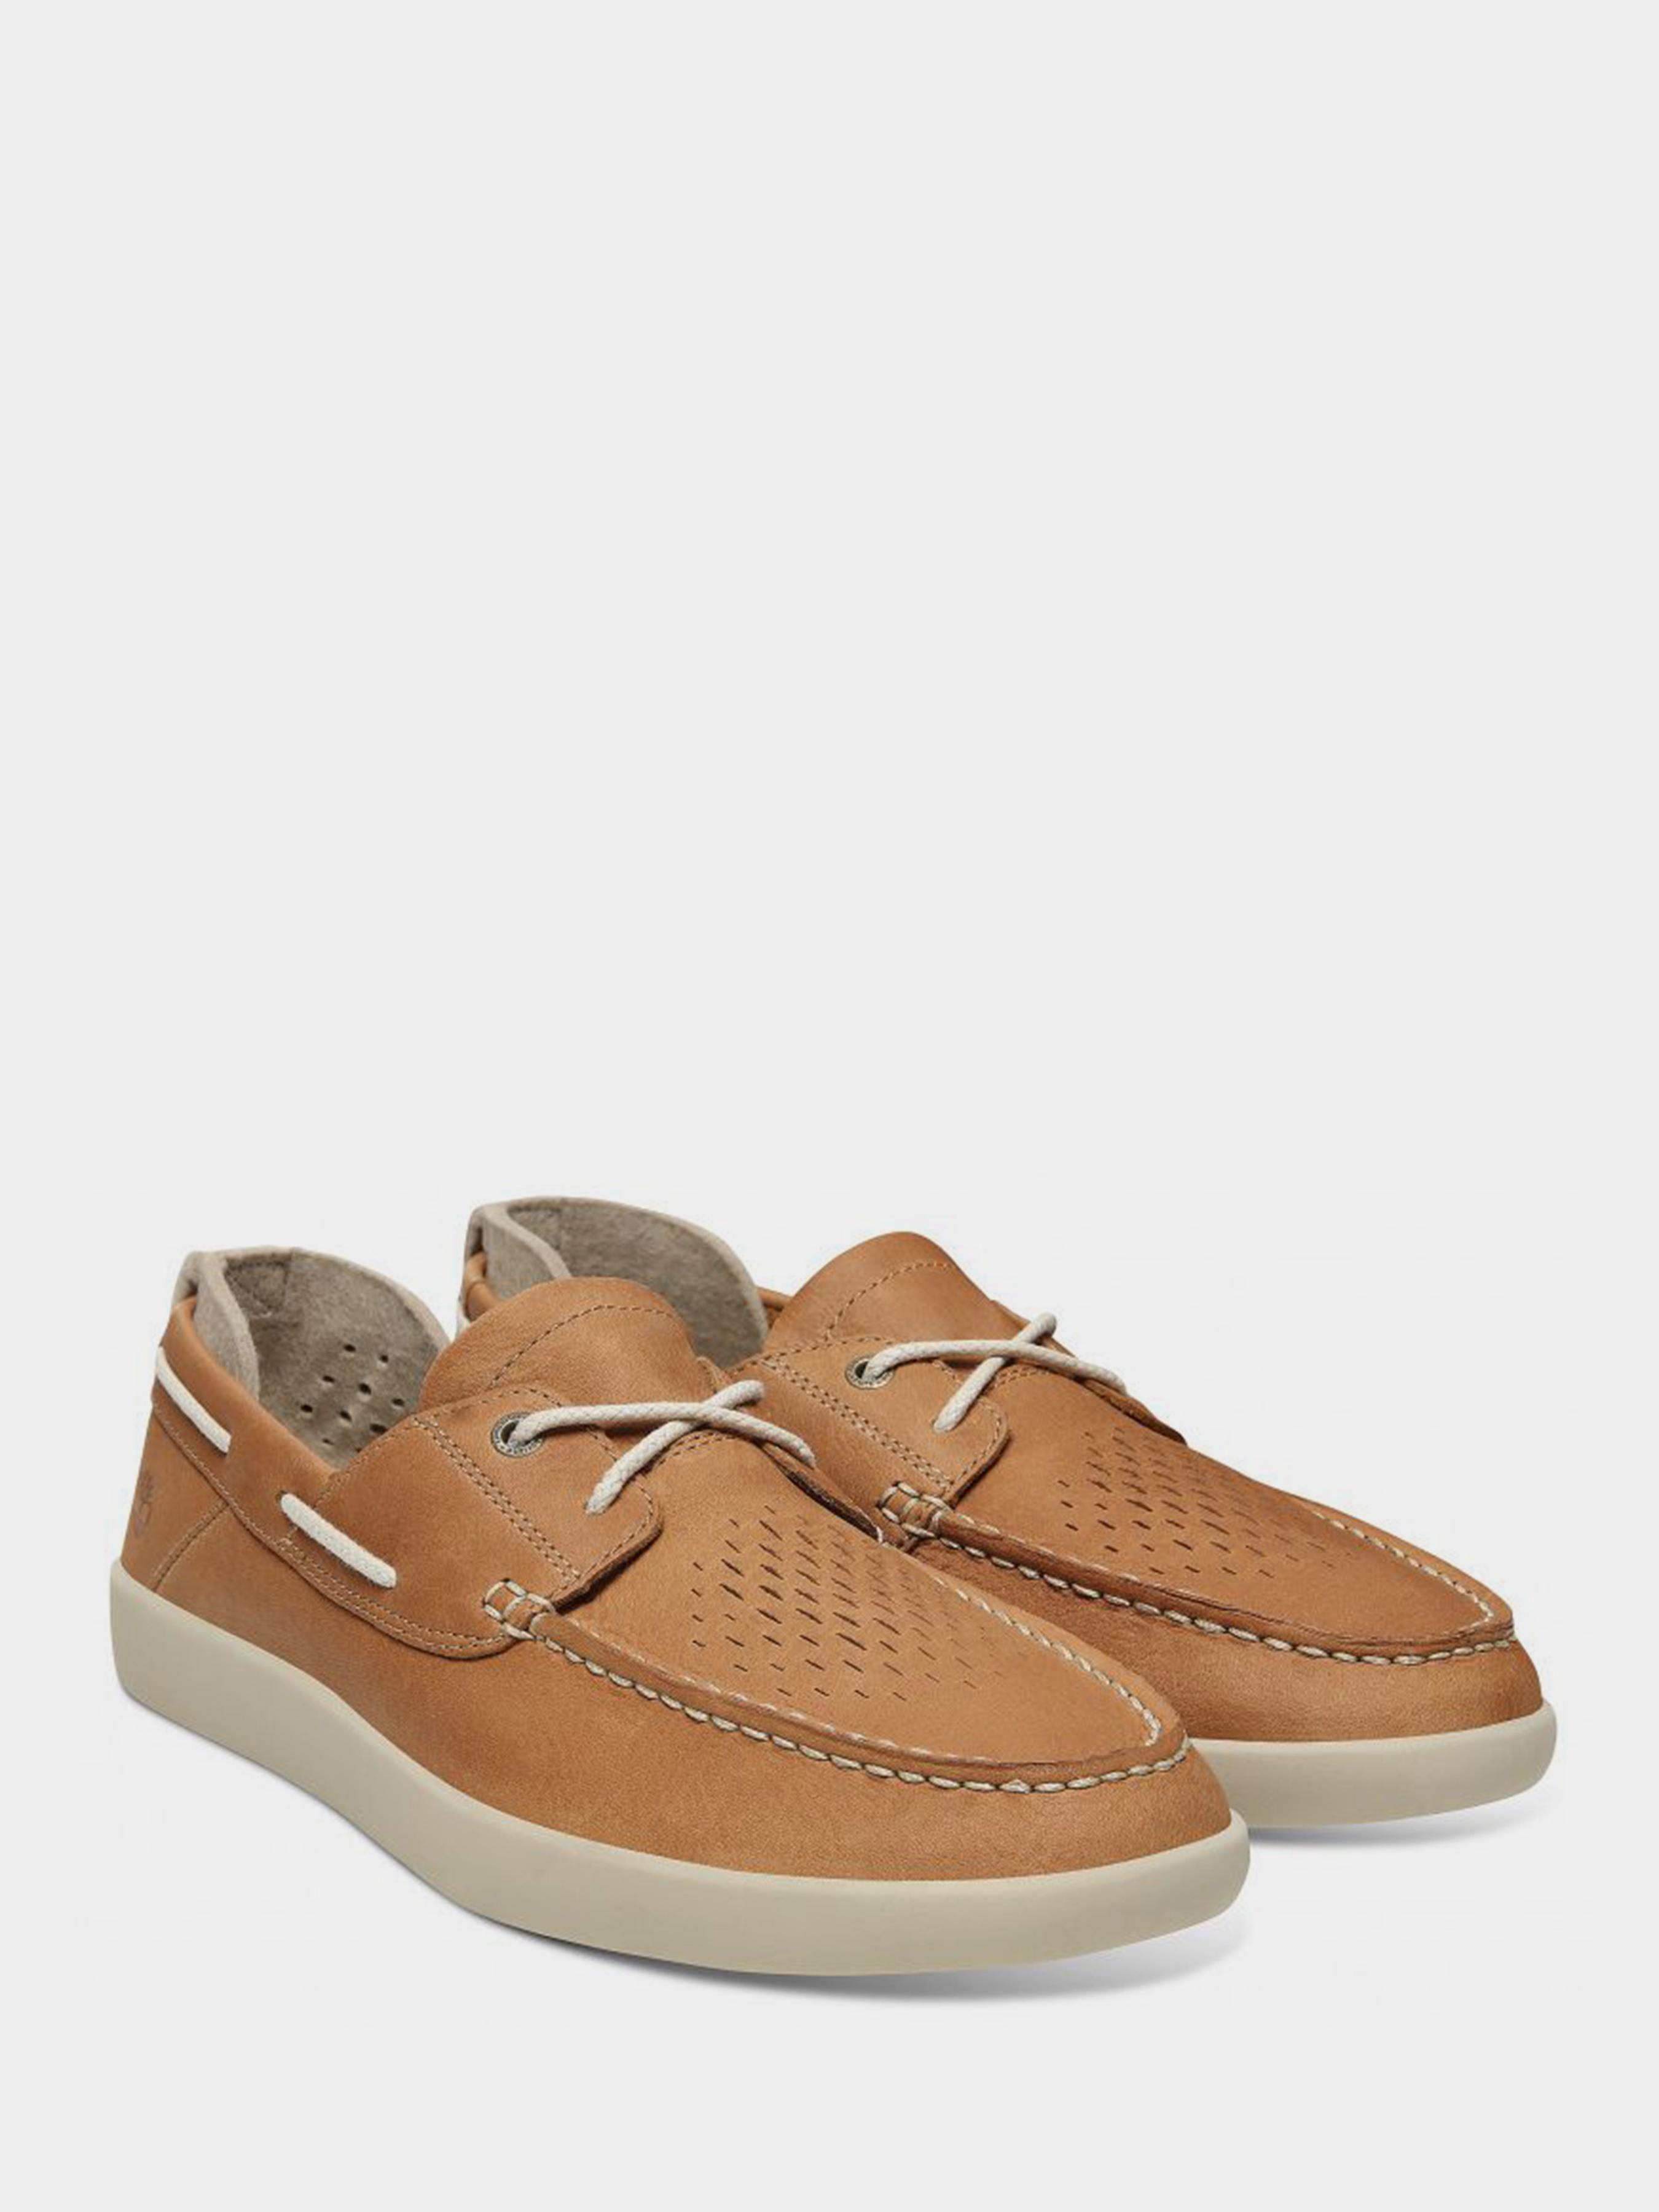 Мокасины для мужчин Timberland Project Better TF3891 модная обувь, 2017